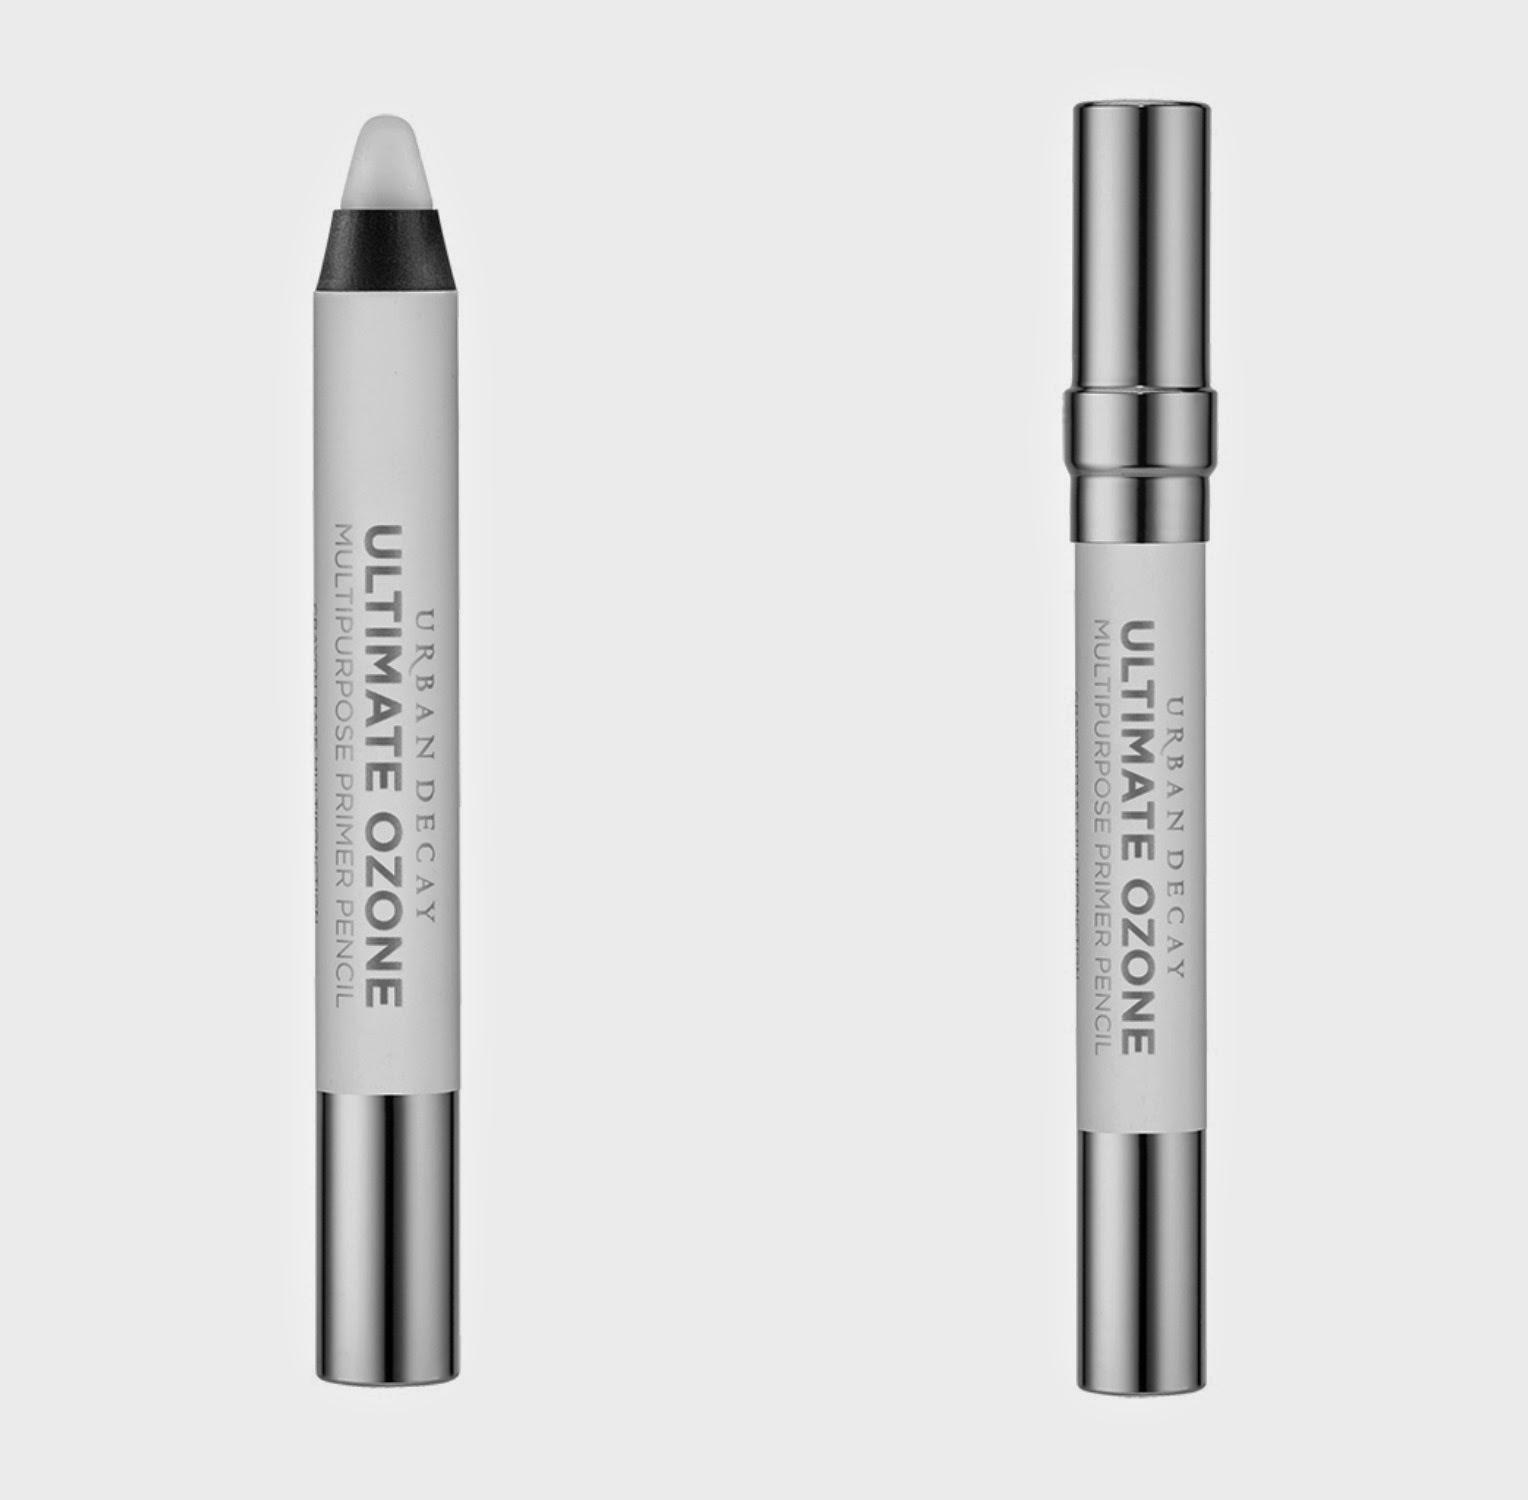 Ultimate Ozone Multipurpose Primer Pencil by Urban Decay #3